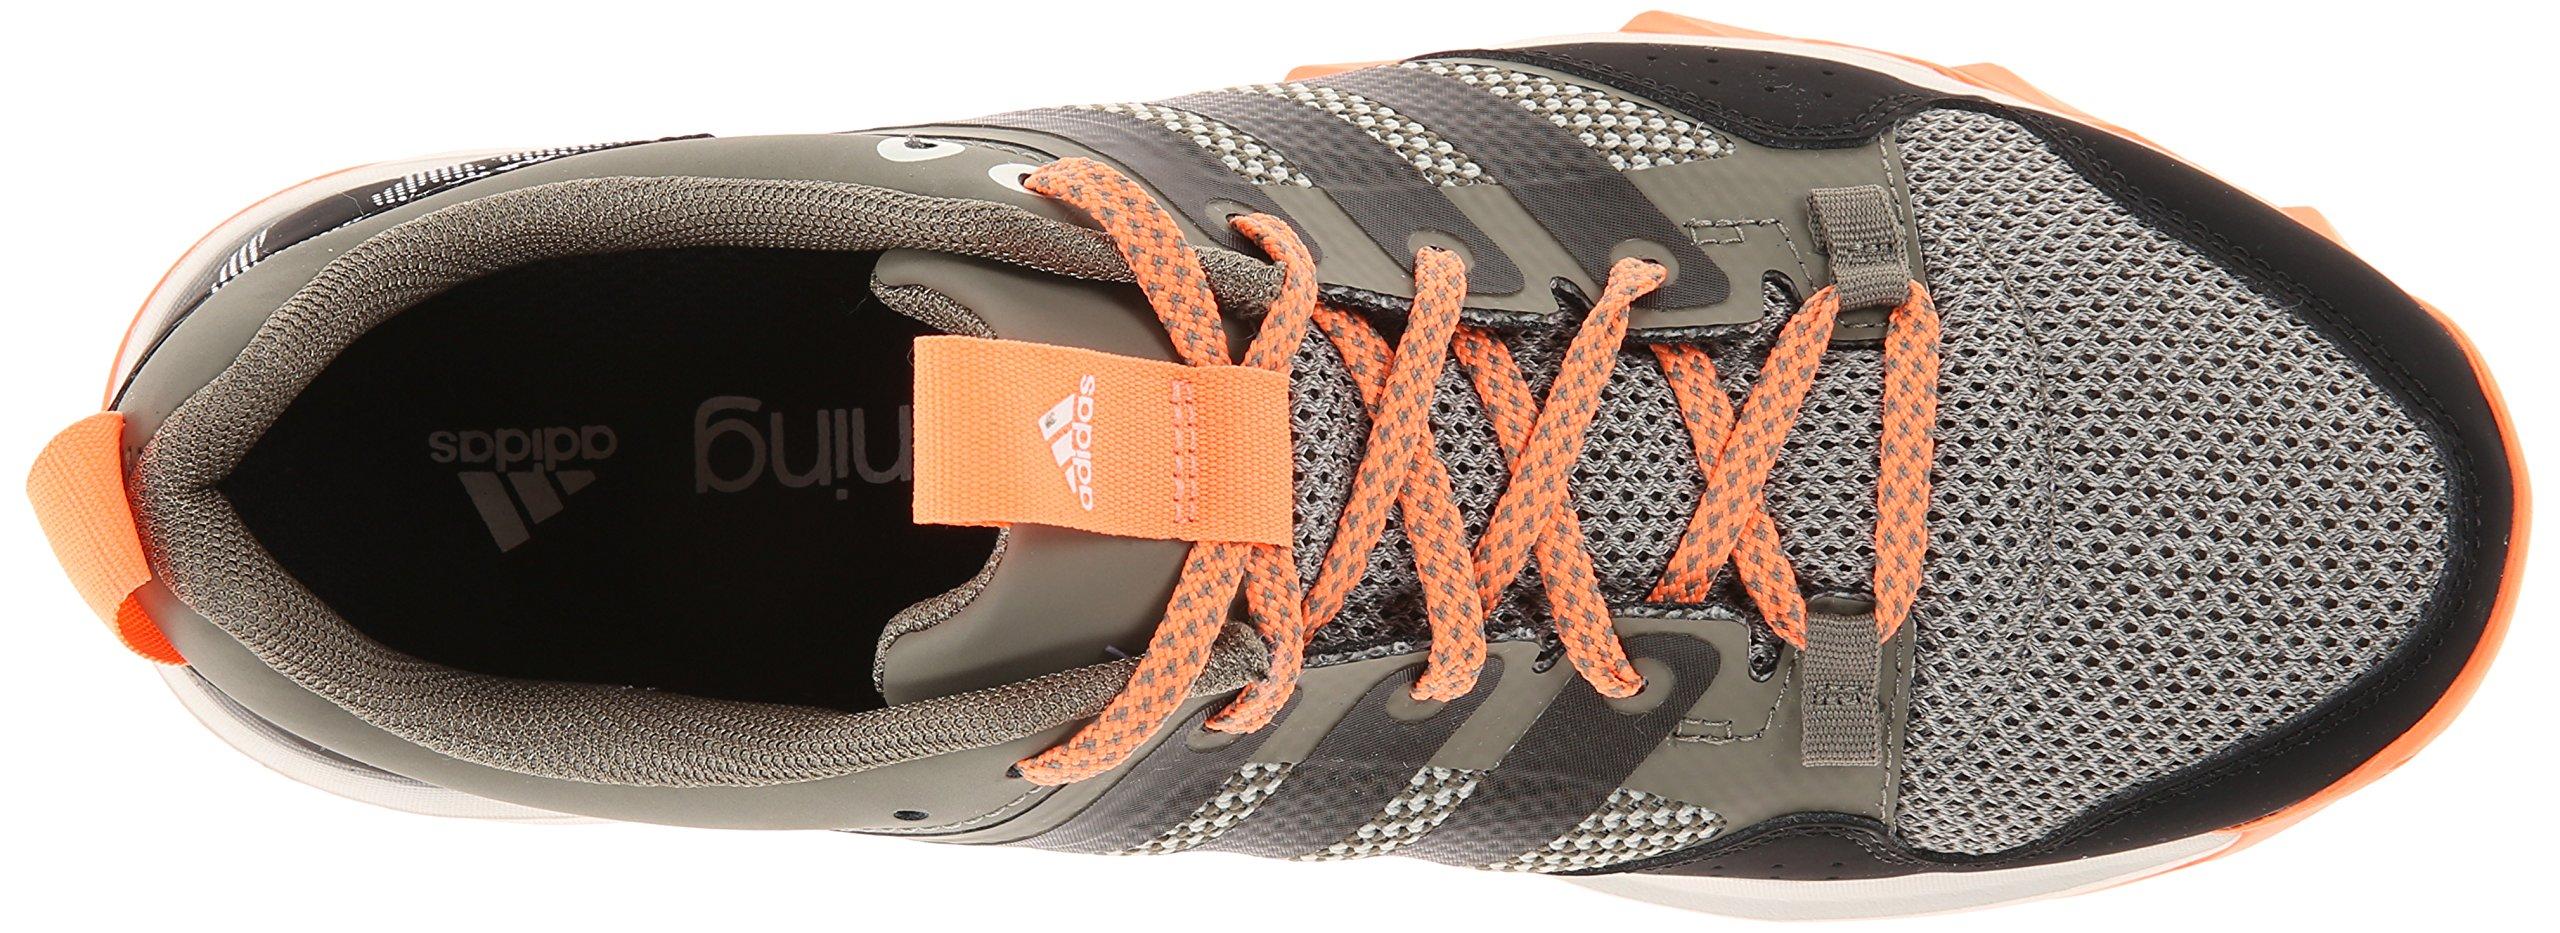 adidas Performance Women's Kanadia 7 TR W Trail Running Shoe, Clay/Chalk/Flash Orange, 7 M US by adidas (Image #8)